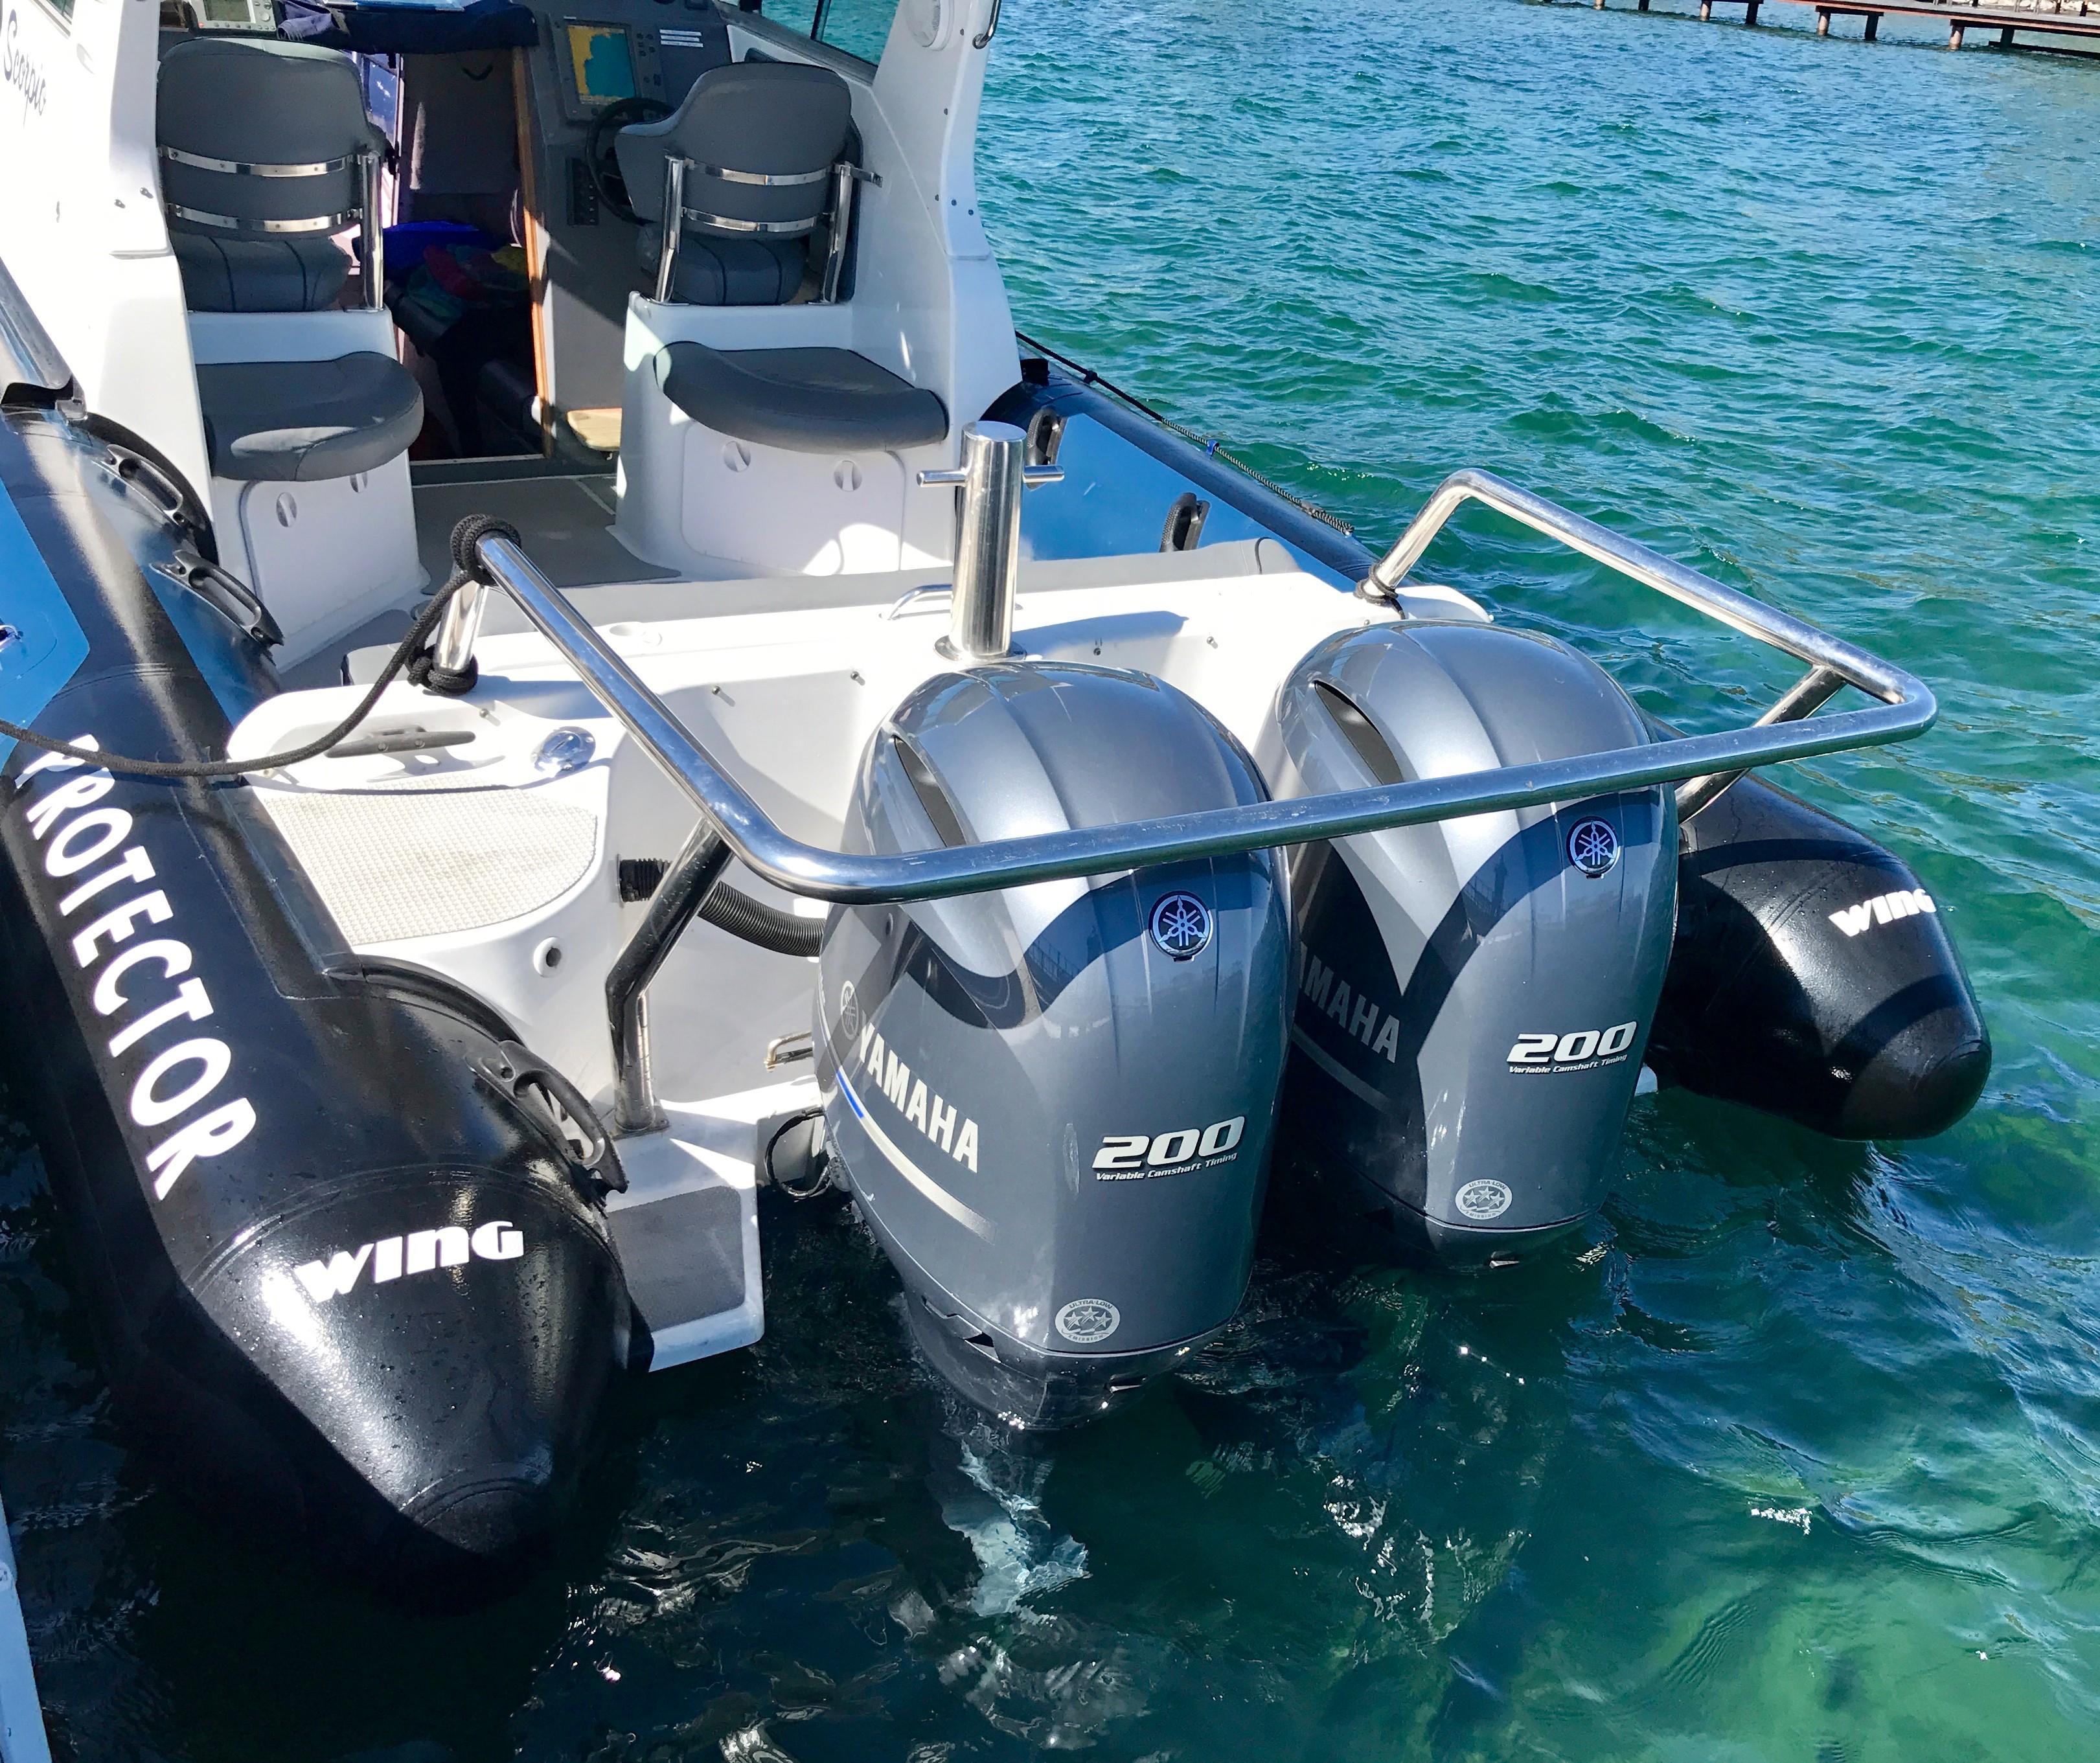 28' Protector Targa 28 Yacht For Sale - Rubicon Yachts